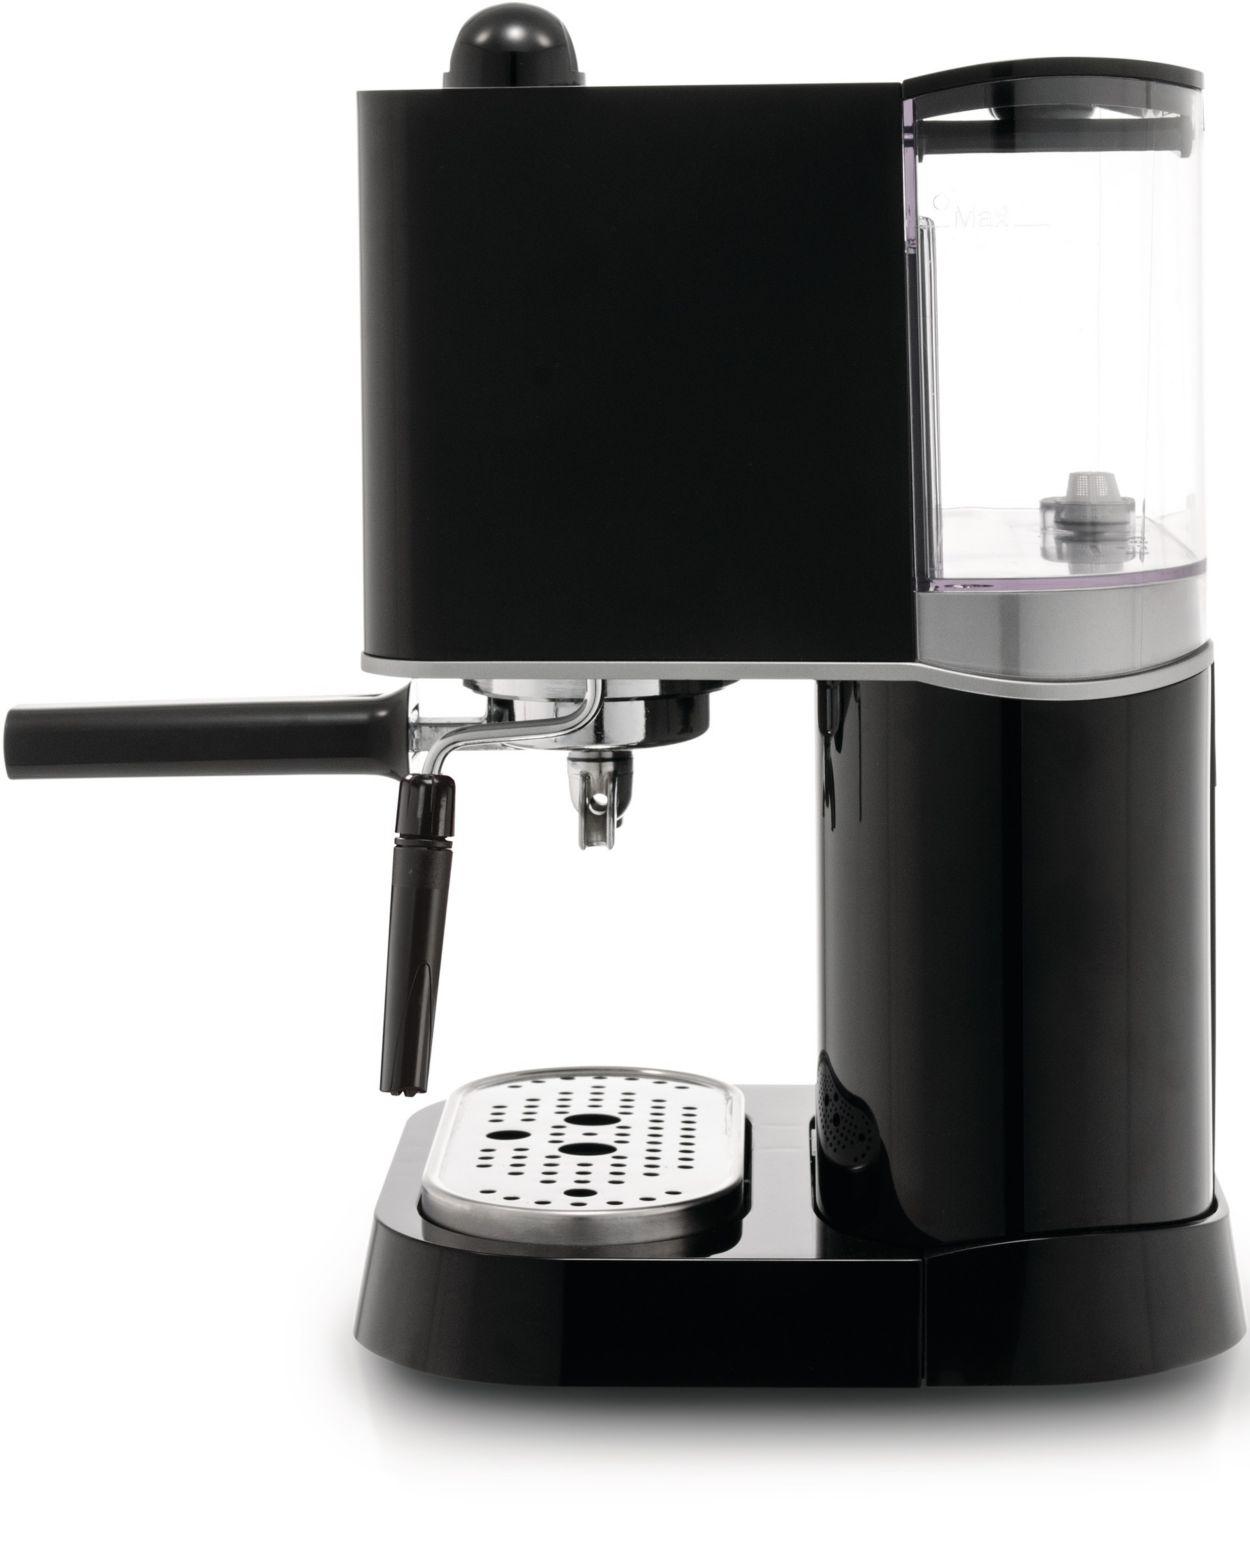 Electronic Baby Gaggia Coffee Machine manual espresso machine ri930111 gaggia gaggias iconic model since 1977